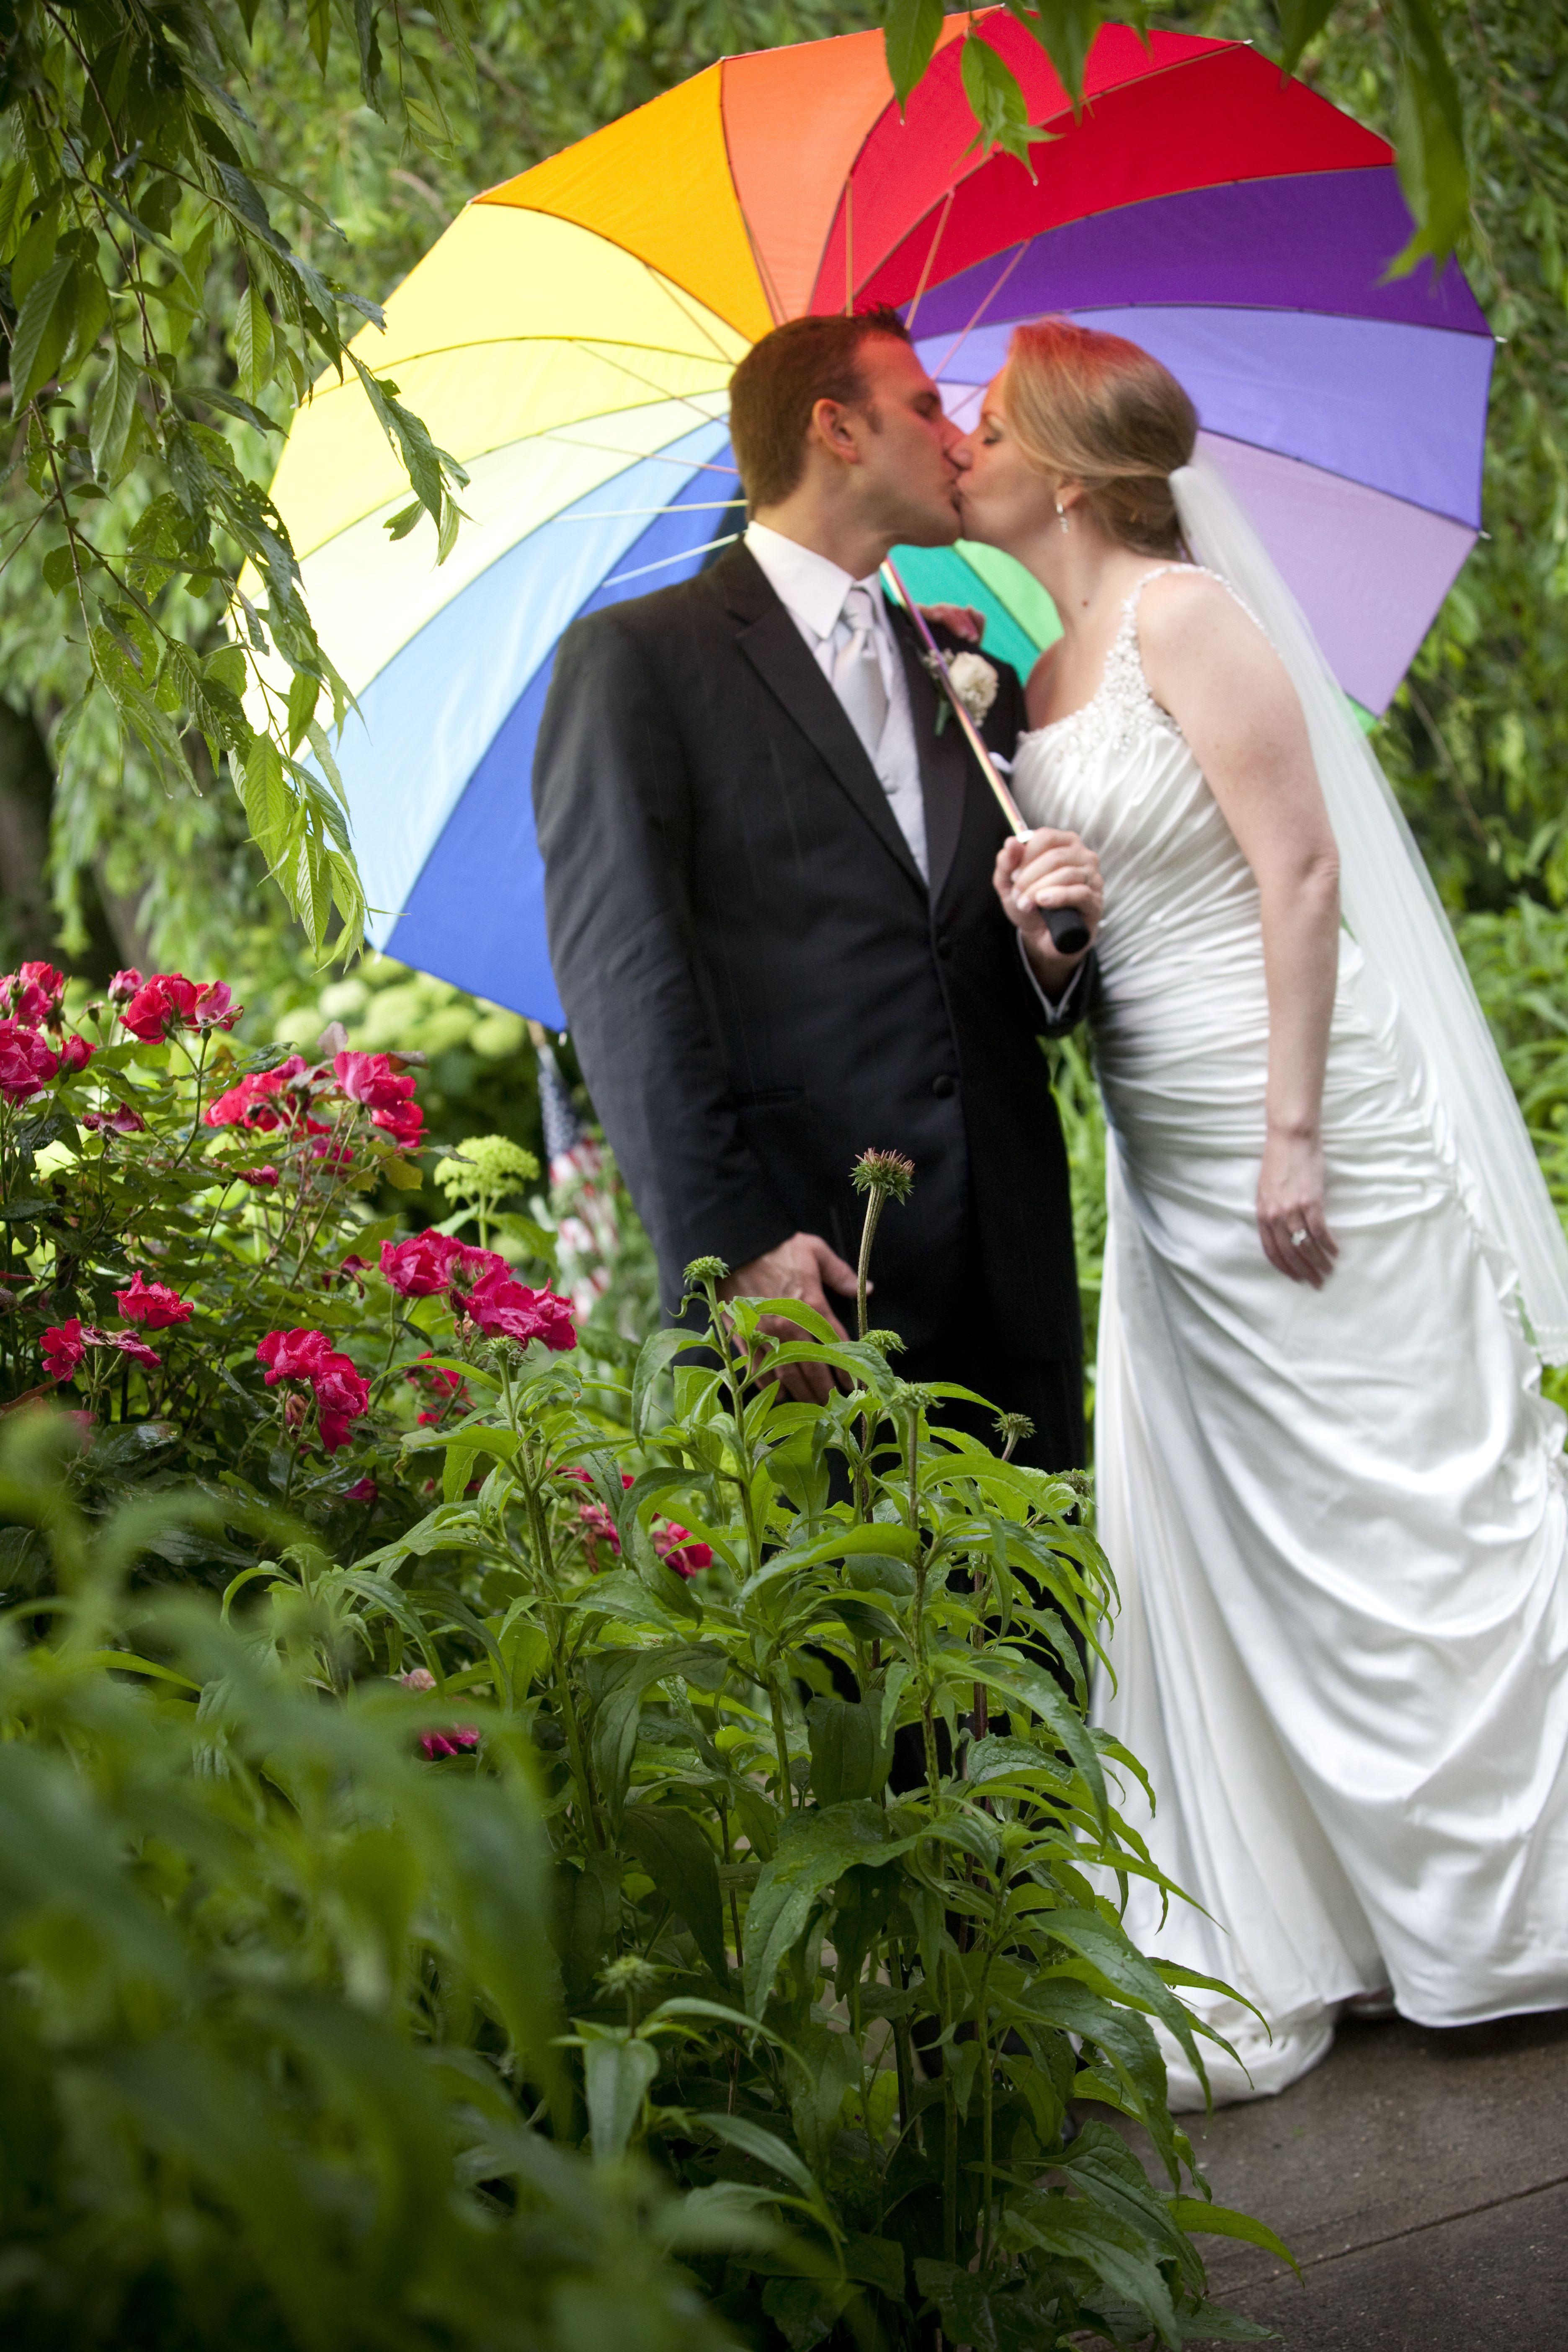 54c0add27087 rainbow umbrella - rainy wedding photos!   Kerry Long Wedding ...